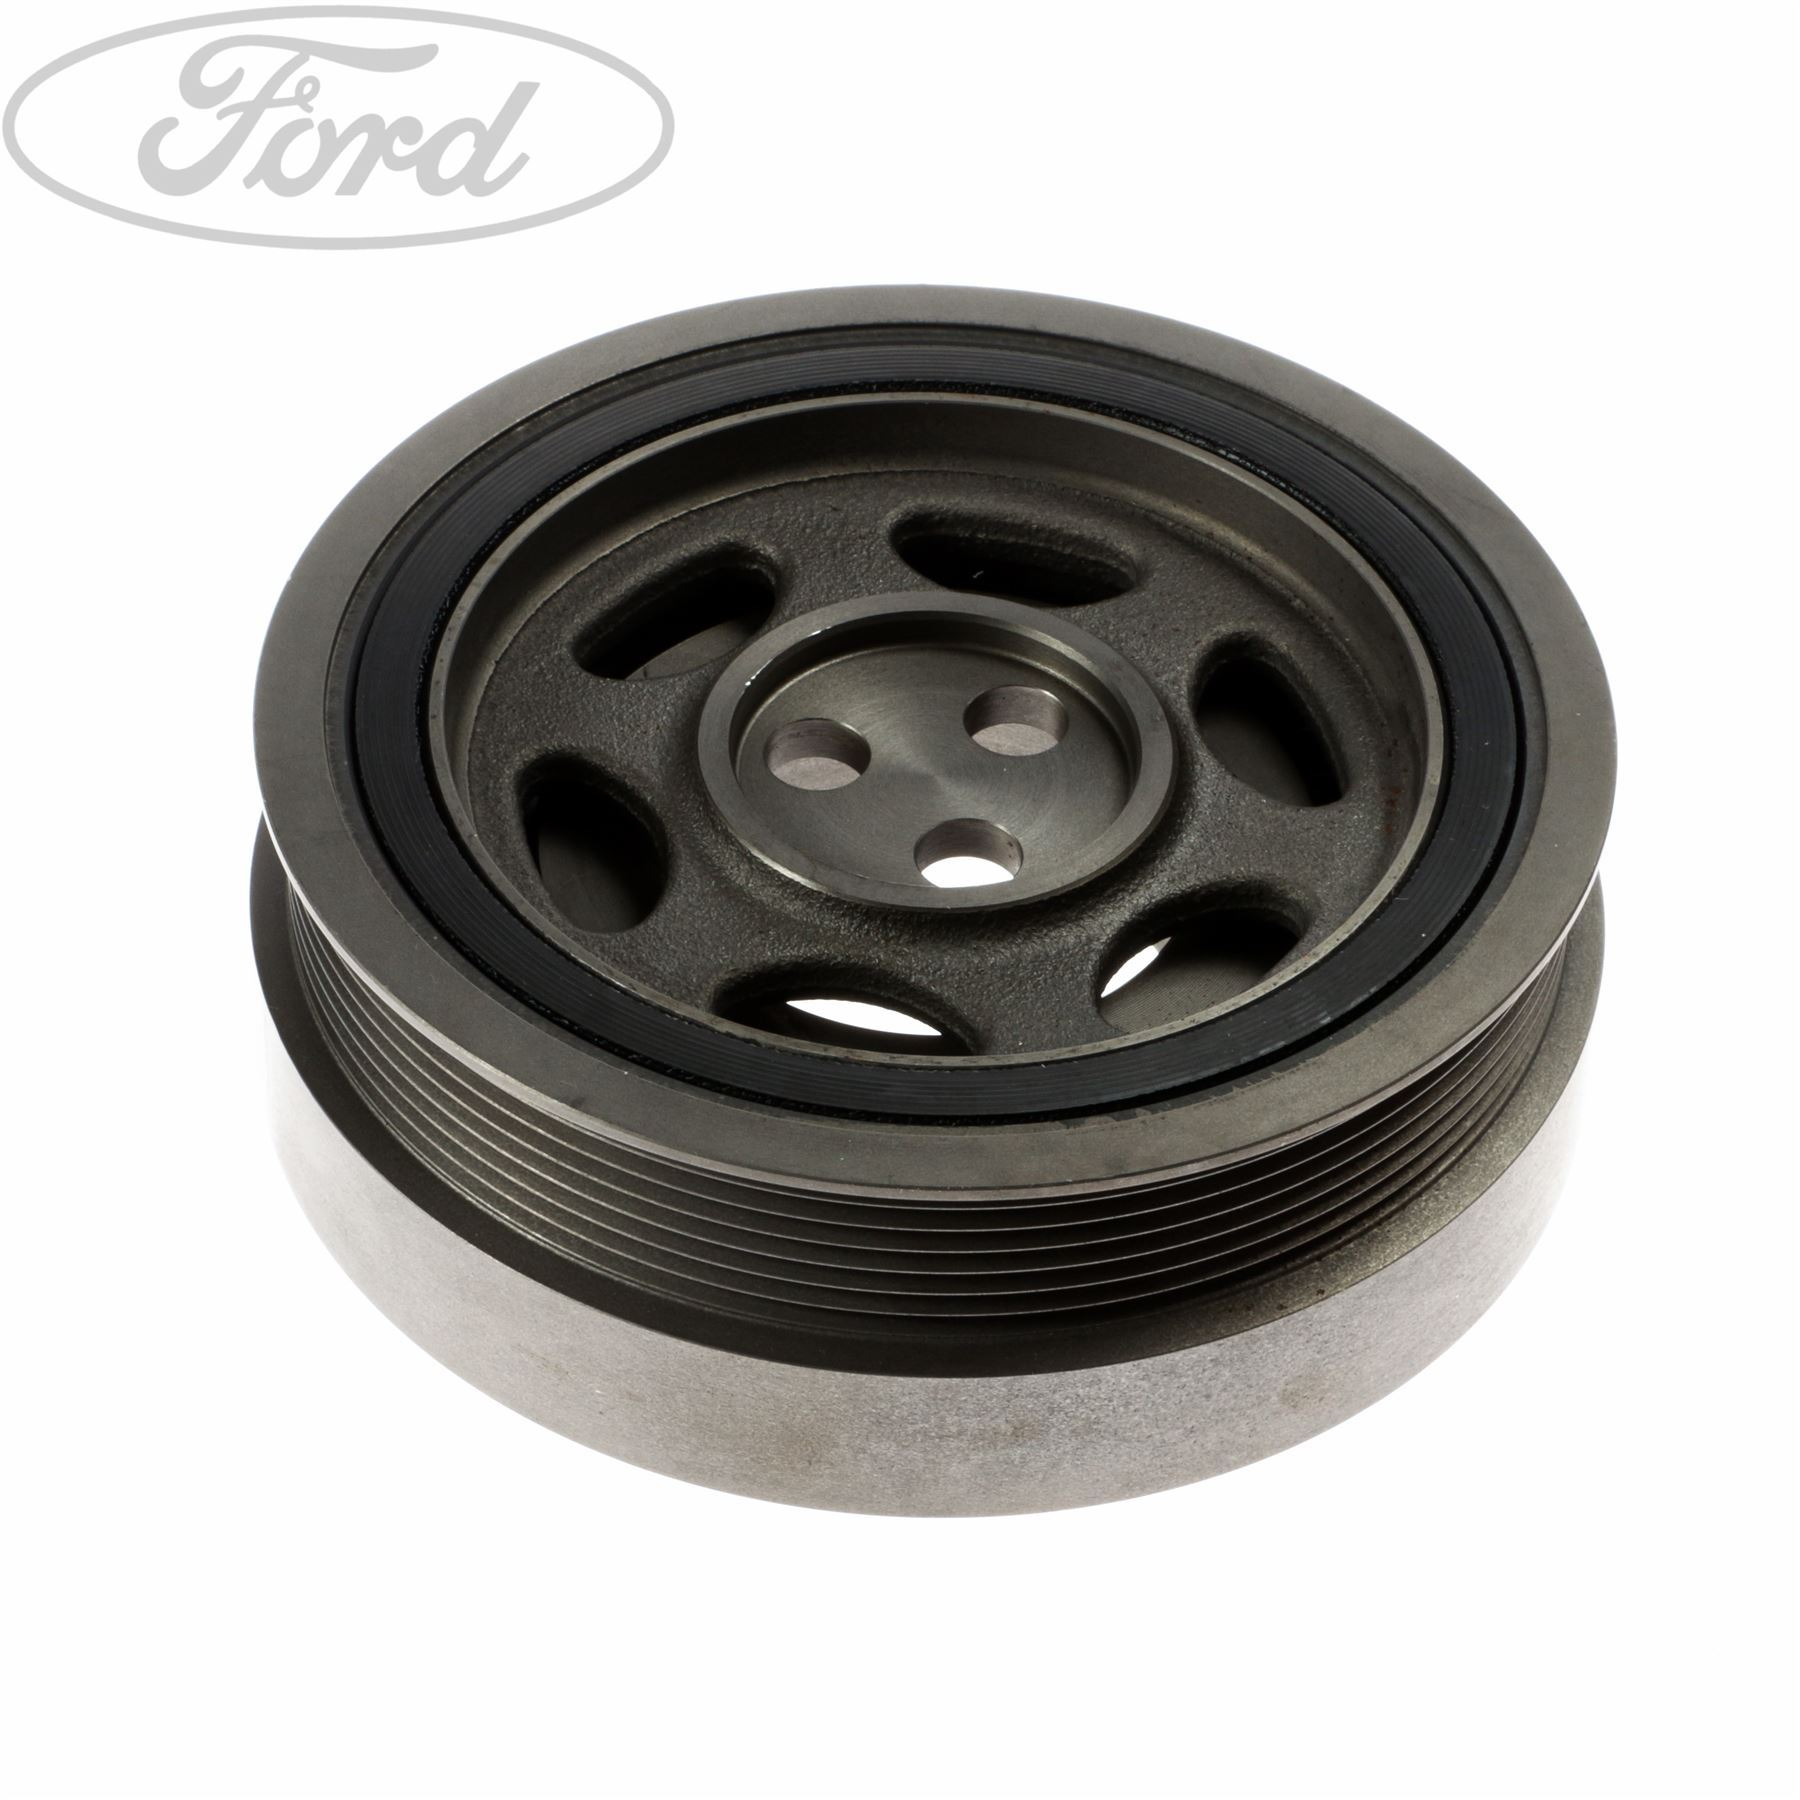 Genuine Ford Ranger 3.2 TDCI Crankshaft Belt Pulley 7PK Decoupled 1717678